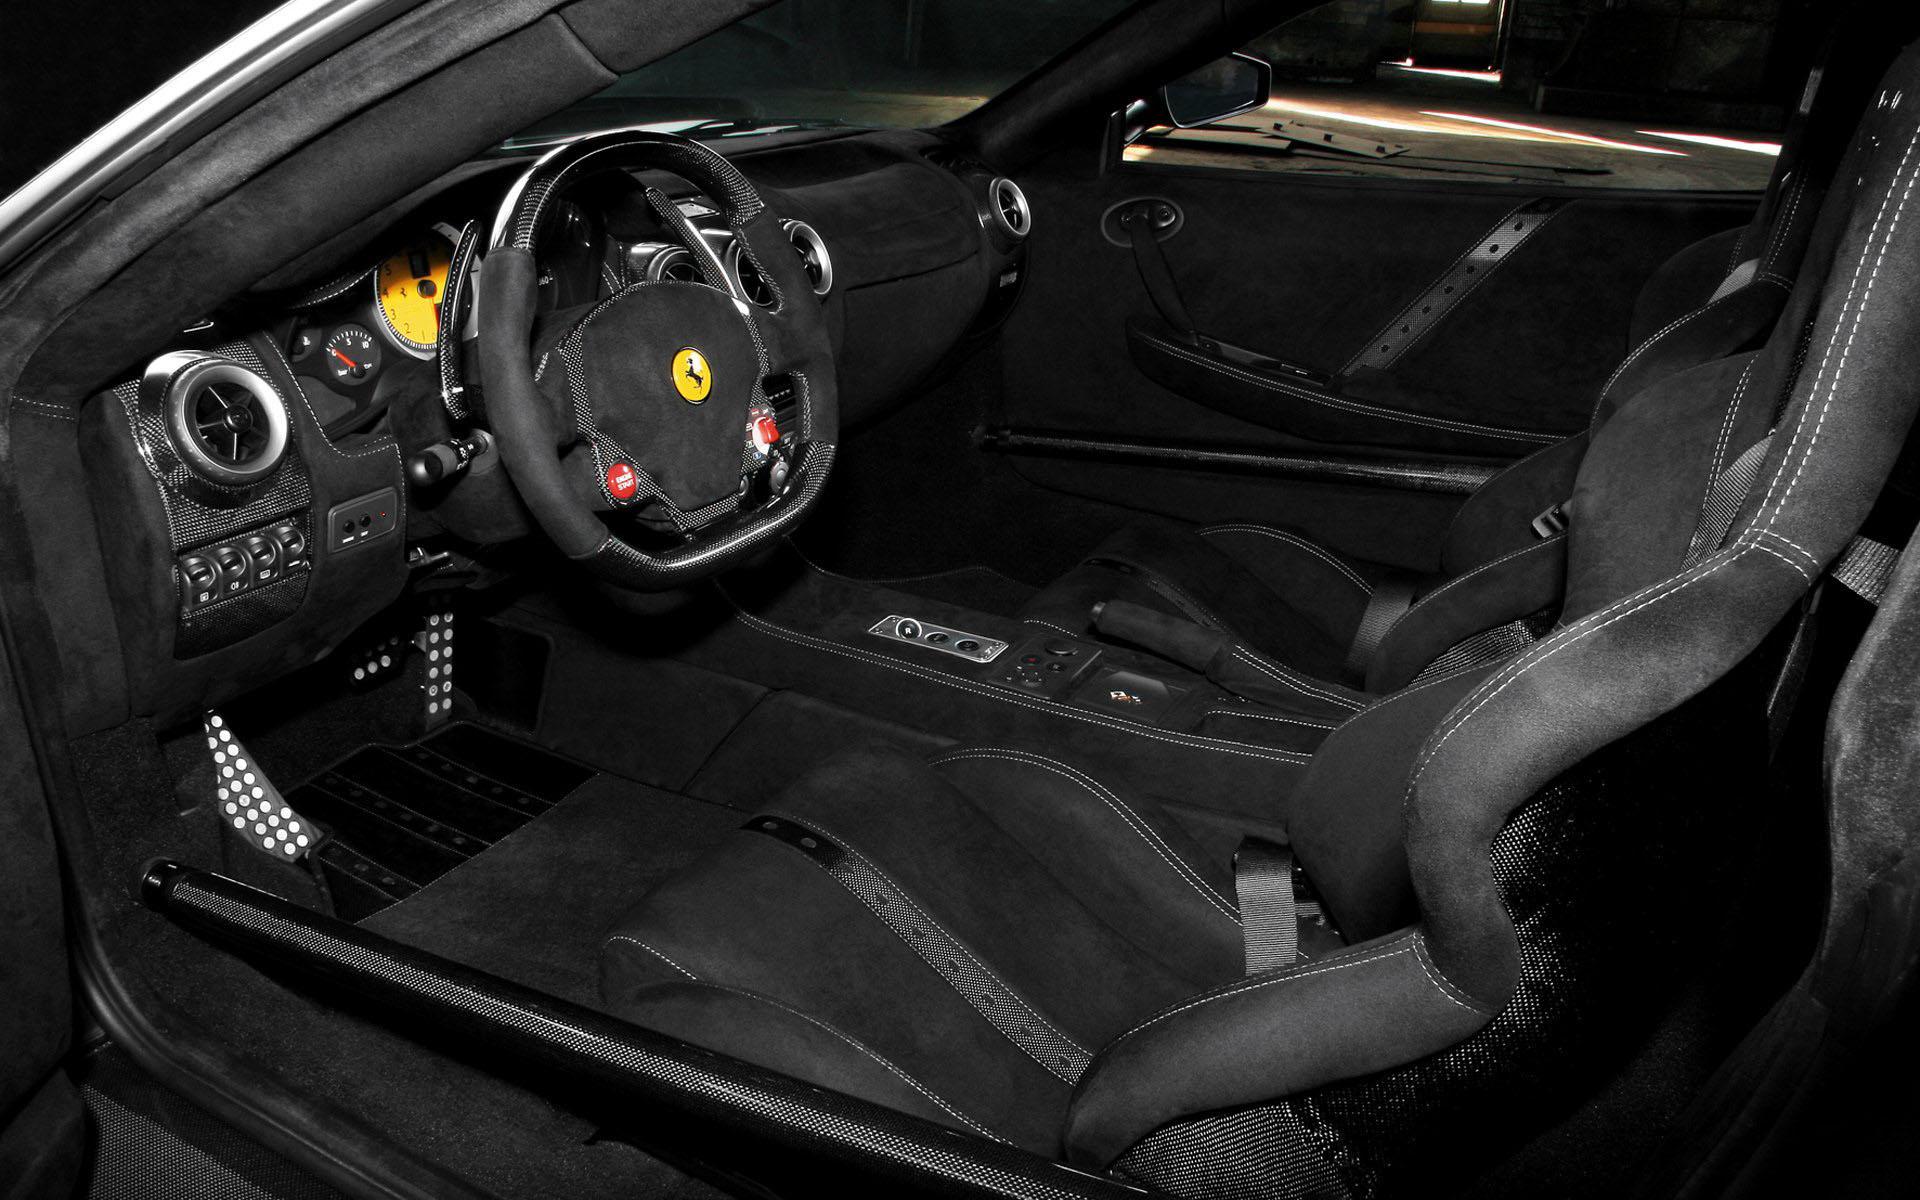 Vehículos - Ferrari  - Ferrari  - Super Fast - Genial - Auto - Vehículos Fondo de Pantalla